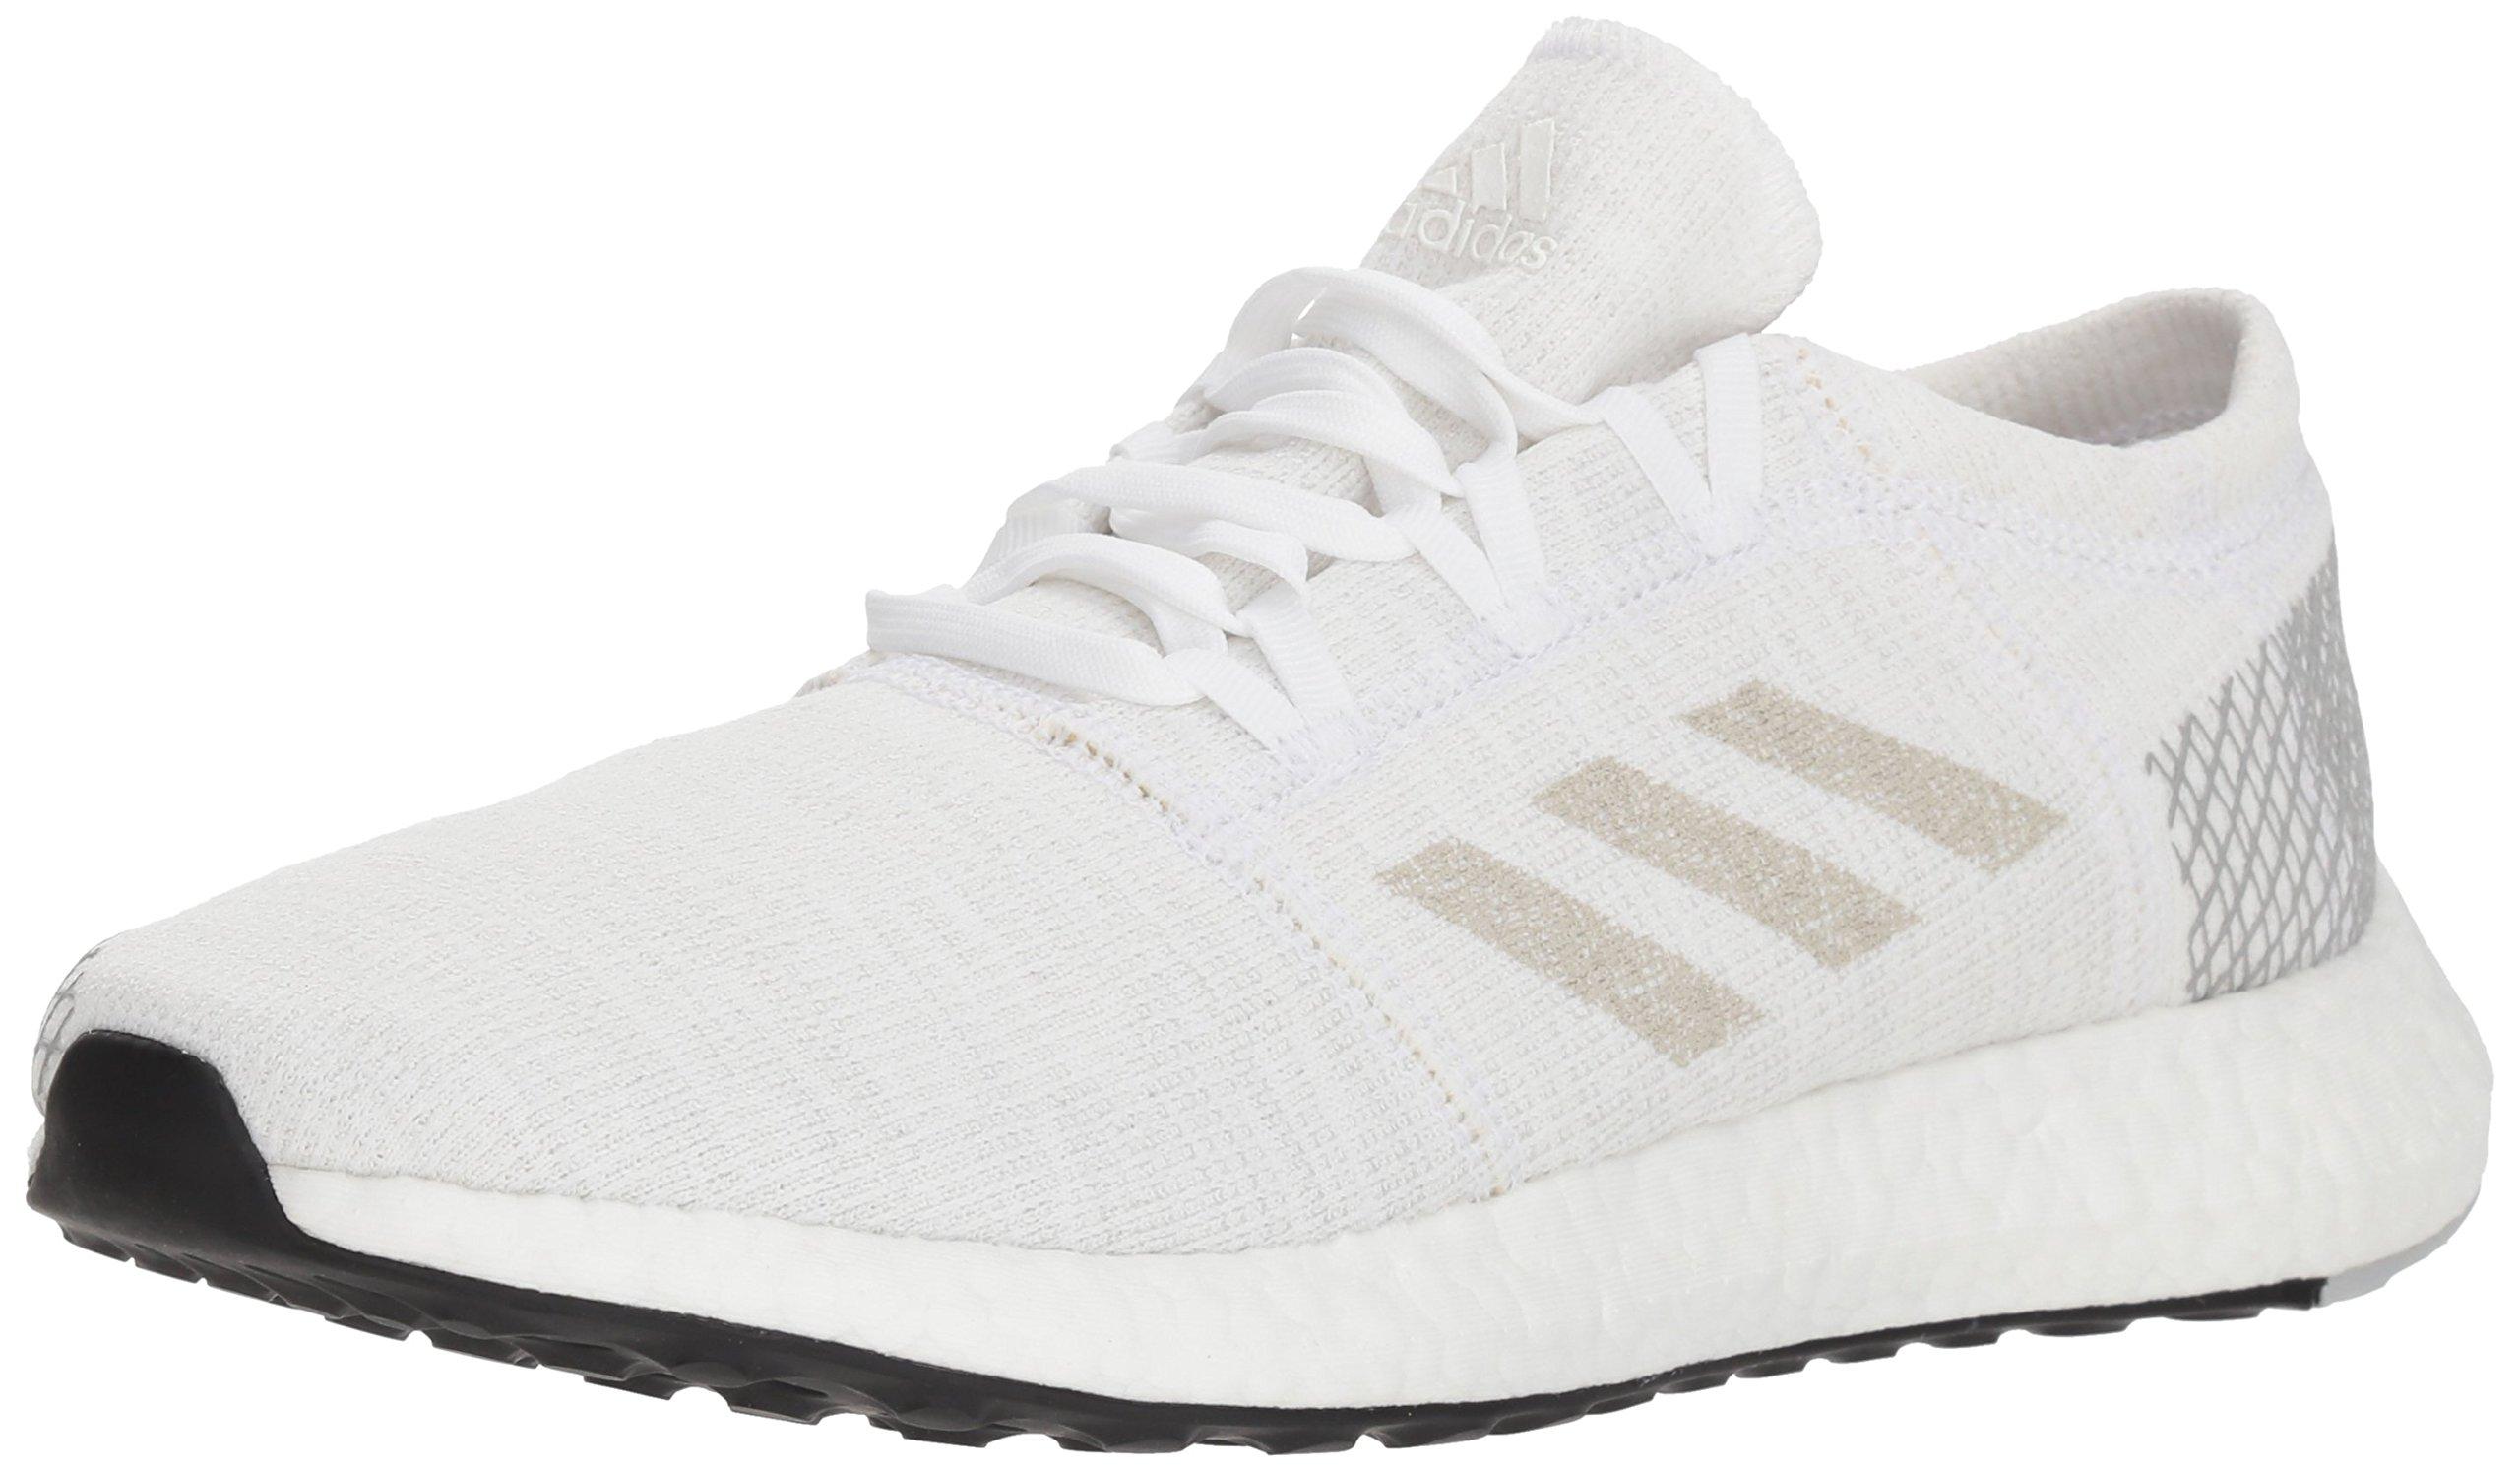 48888a1132725 Galleon - Adidas Men s Pureboost Go Running Shoe